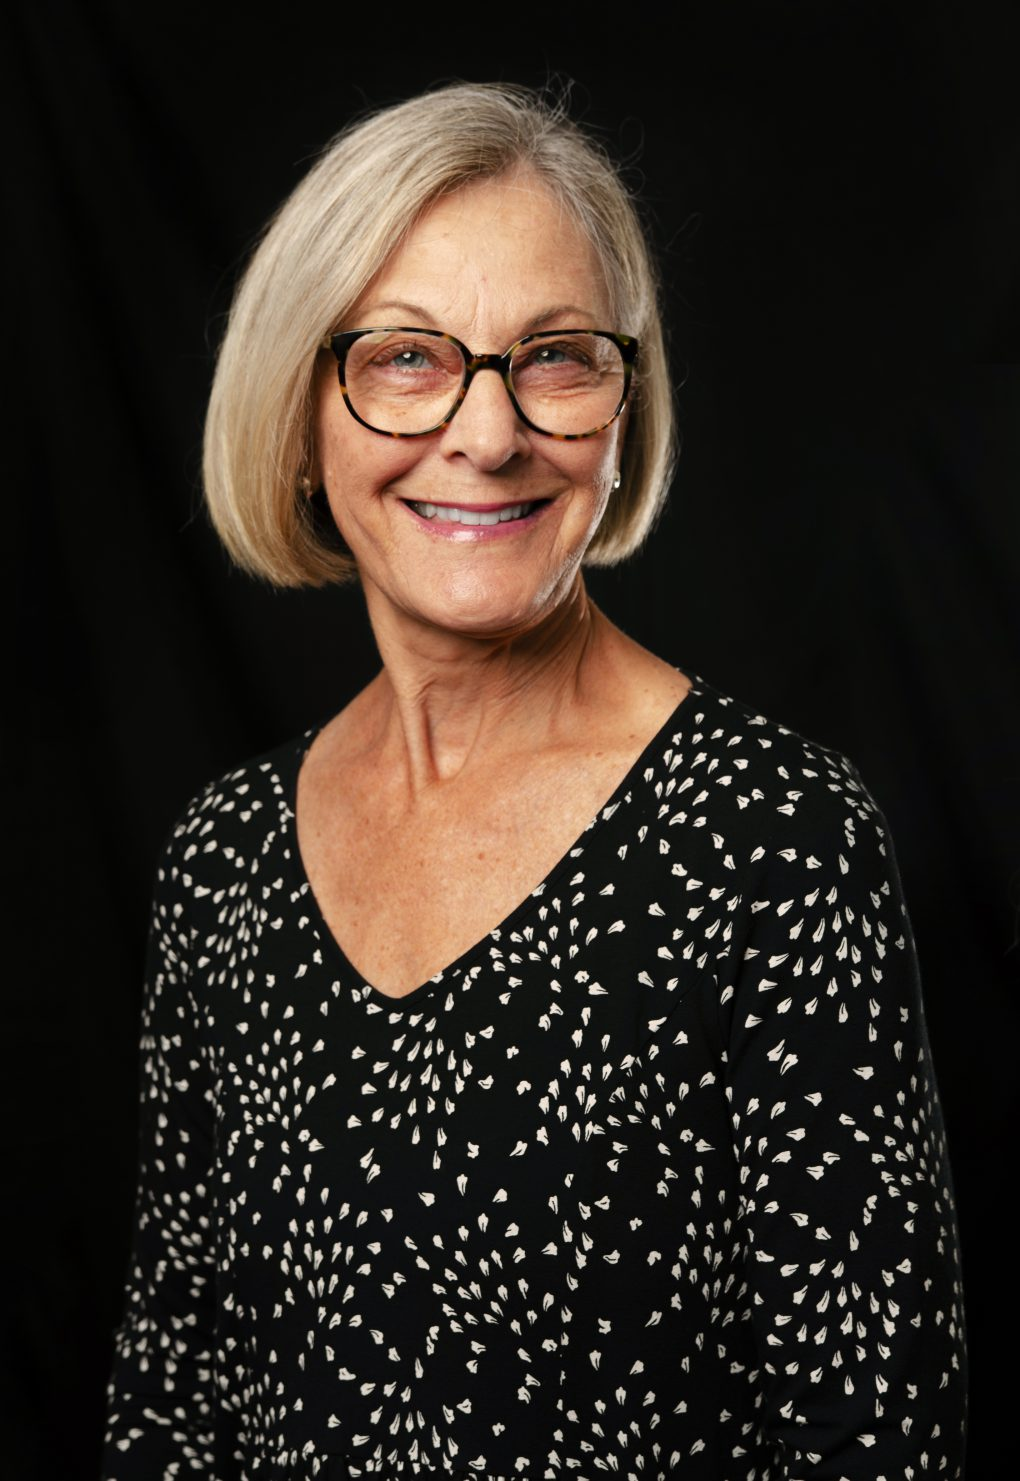 Christine Browning